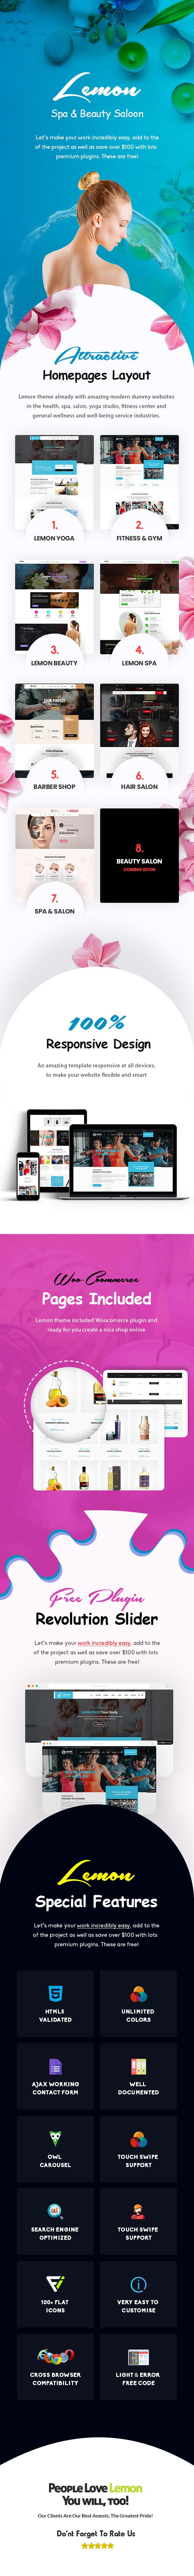 Zitrone | Spa & Beauty Responsives WordPress-Mehrzweckthema - 1